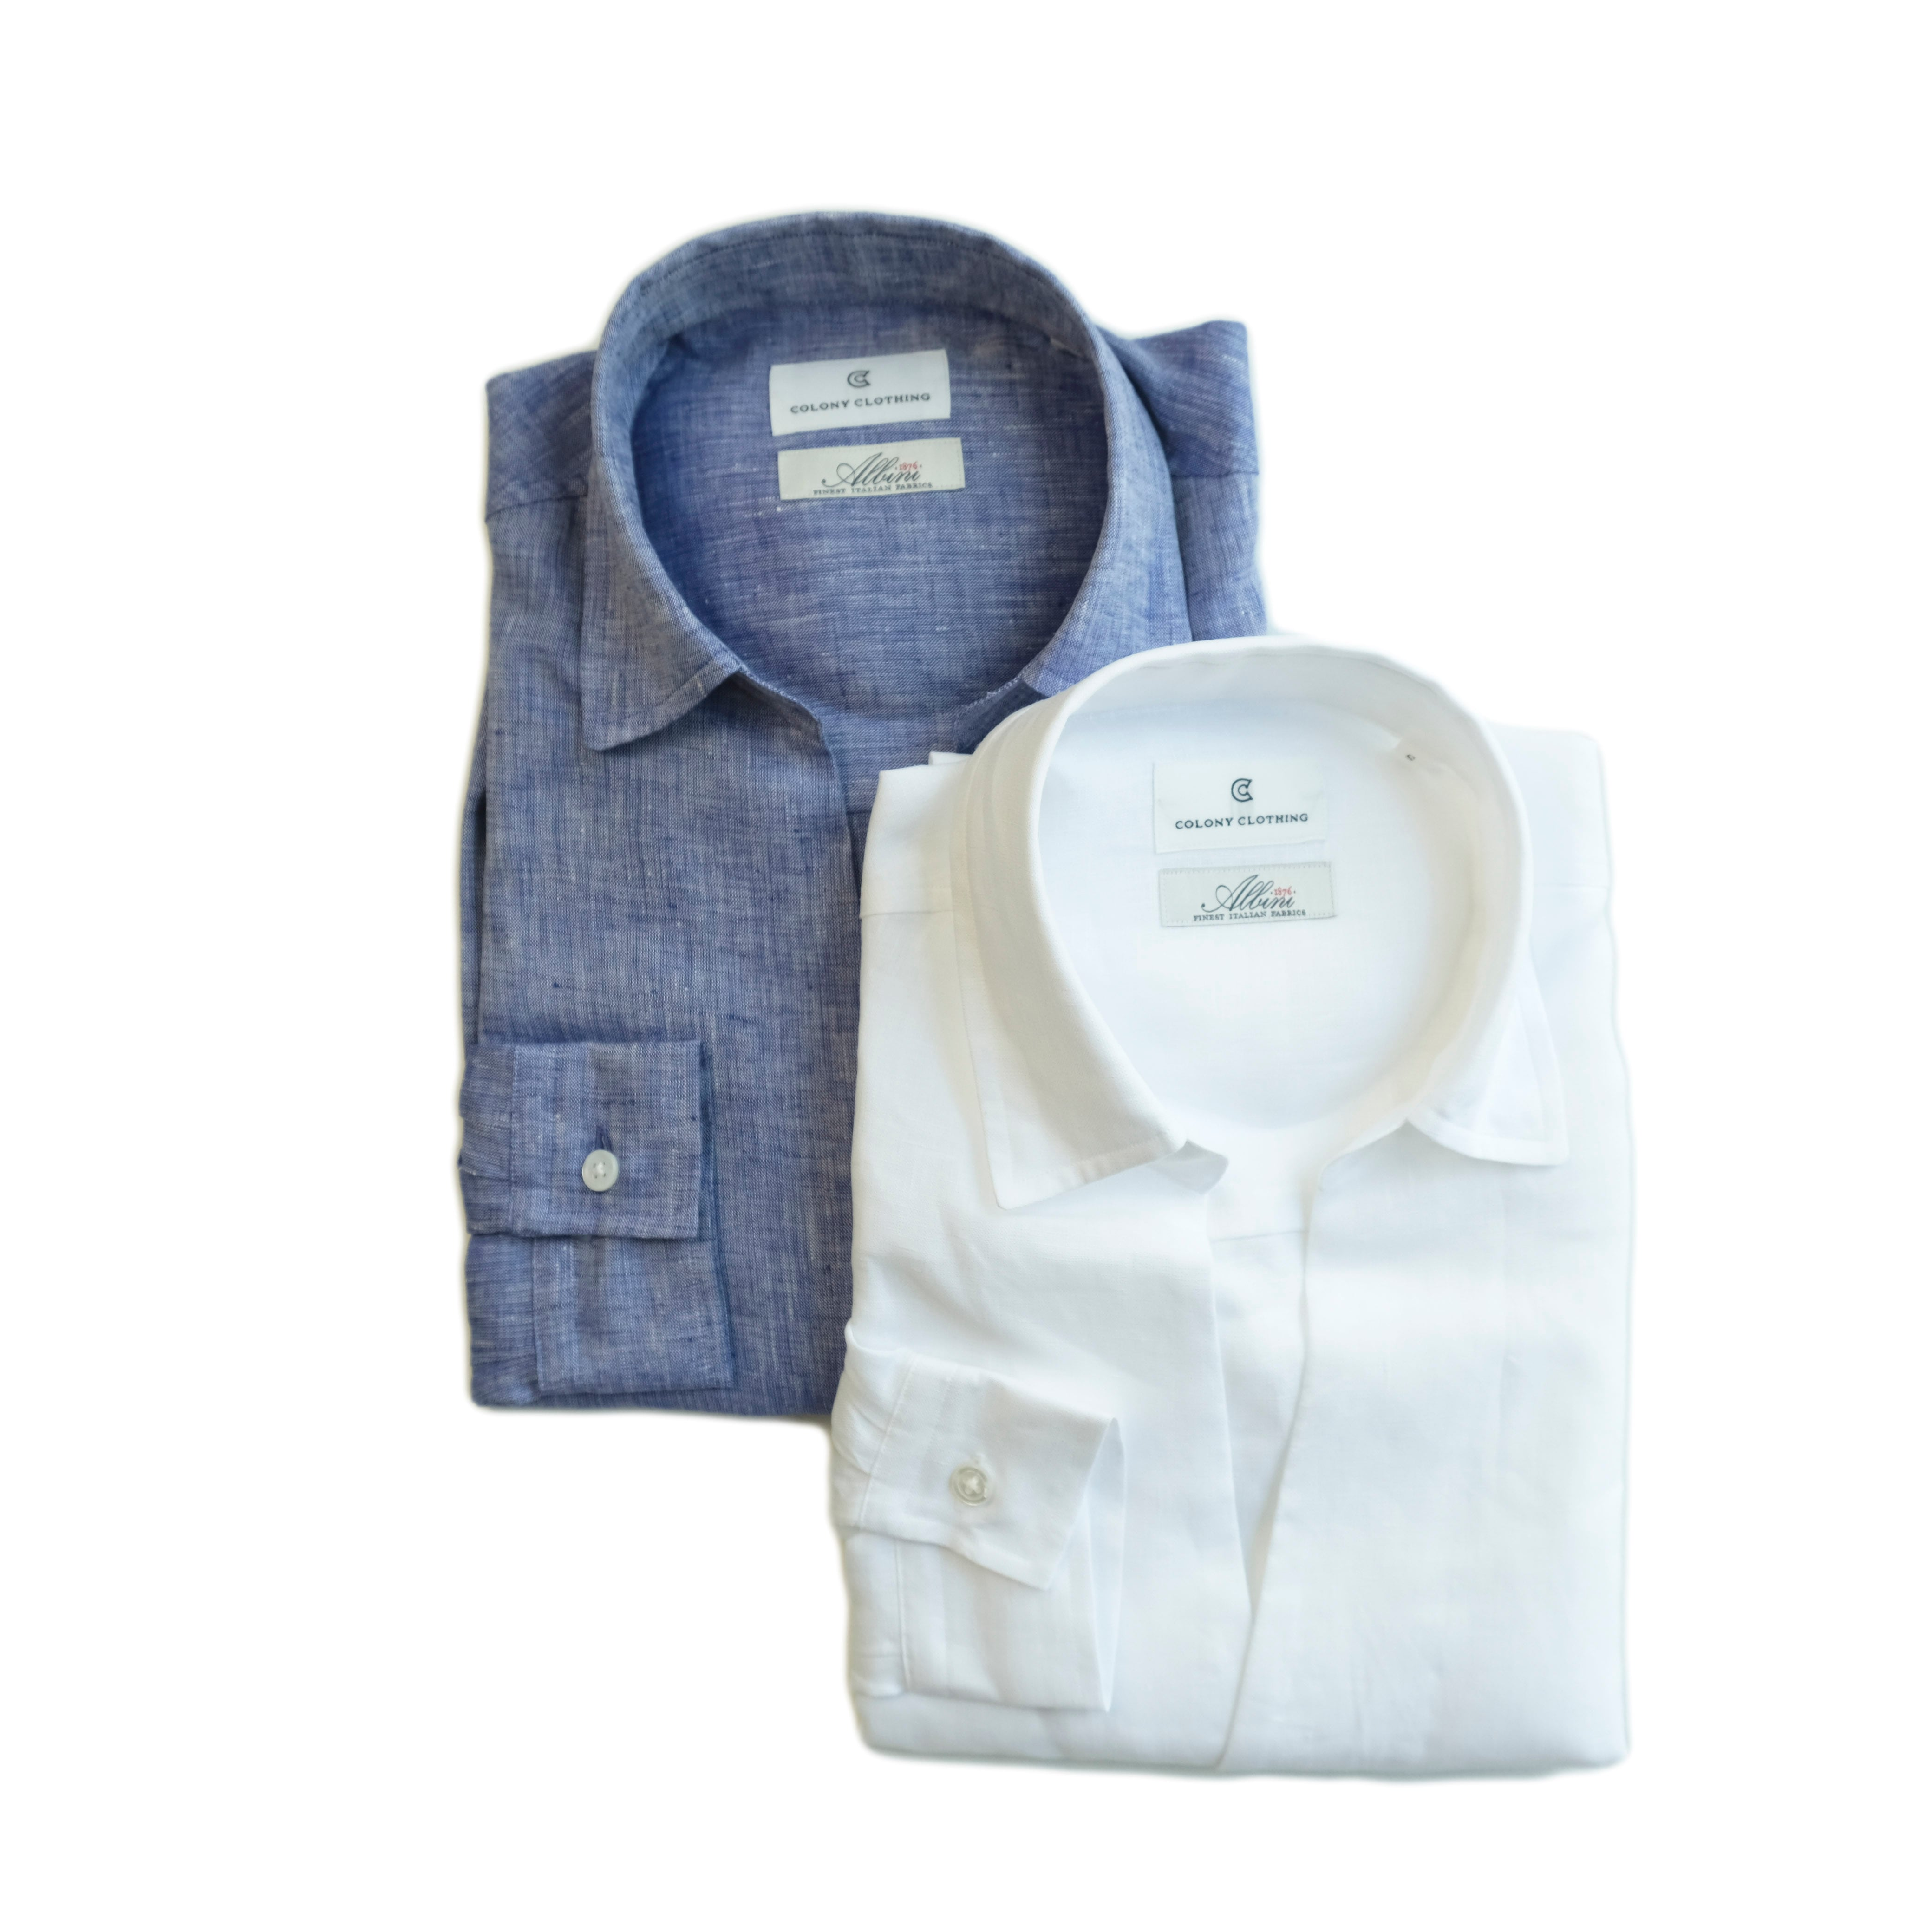 COLONY CLOTHING / ALBINI LINEN POOL SIDE SHIRT / CC21-SH02-1(SALE)